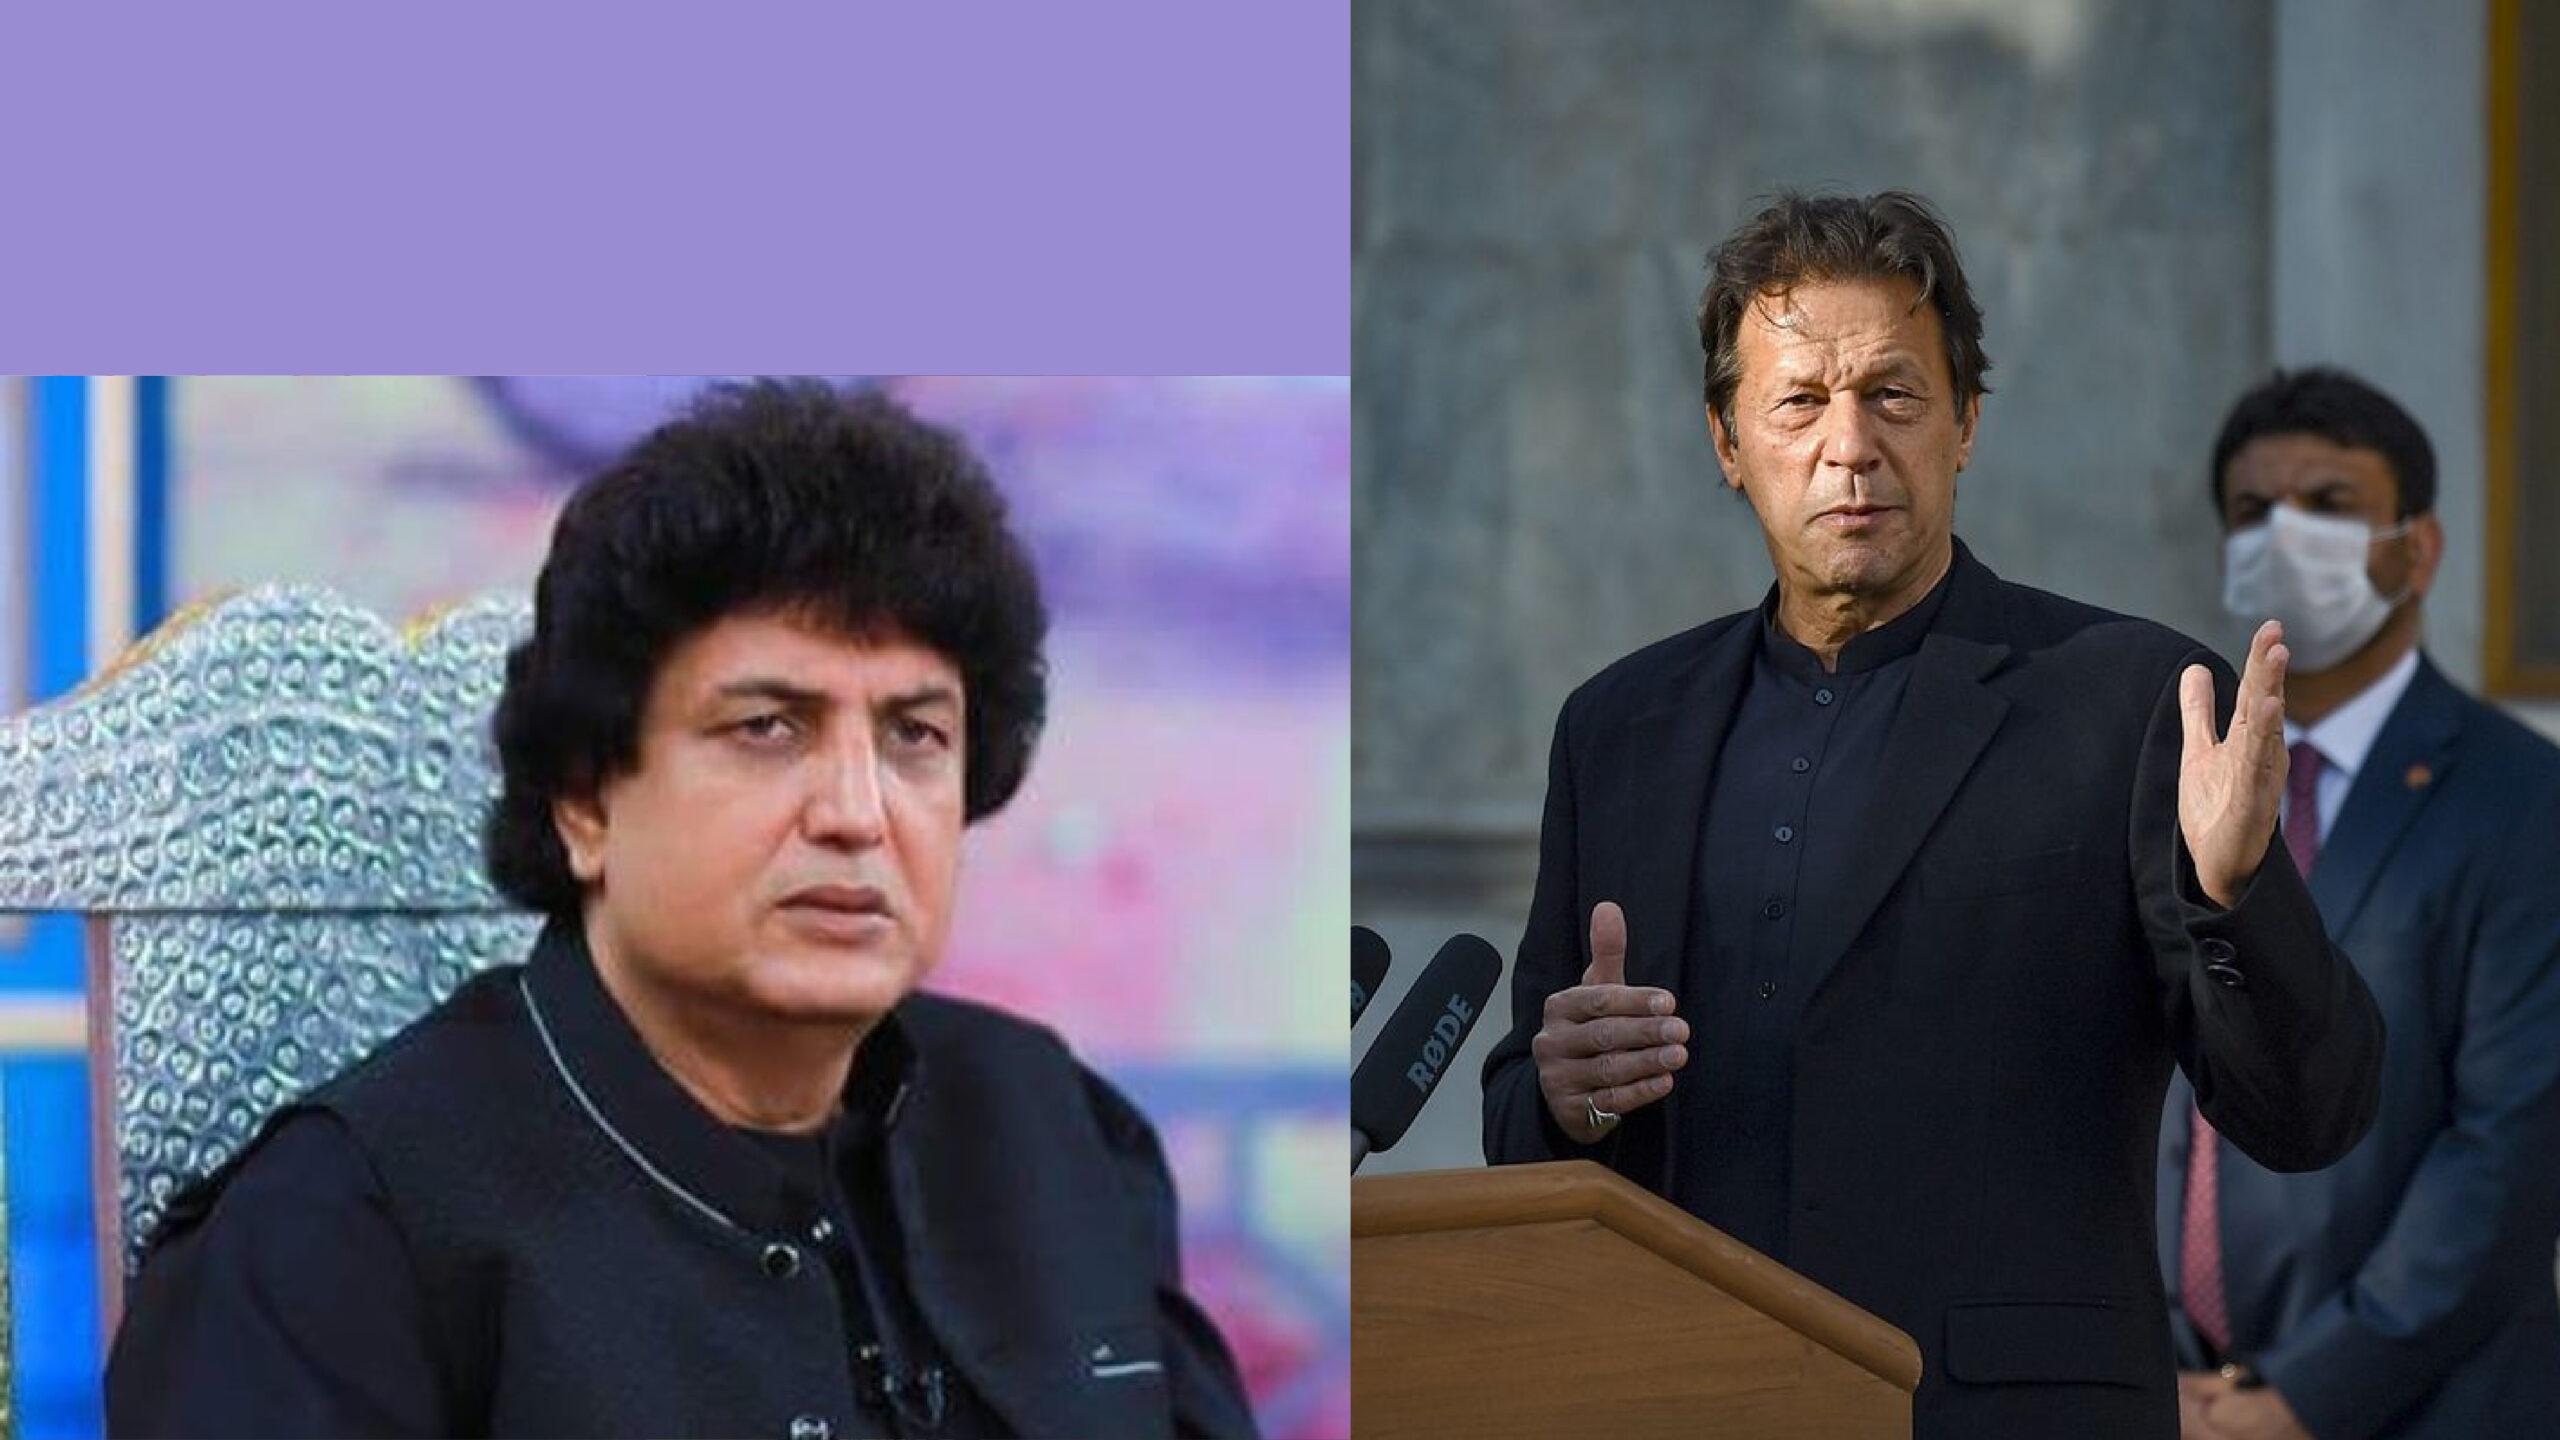 Khalil-ur-Rehman Qamar sides with PM Khan over his statements on rape